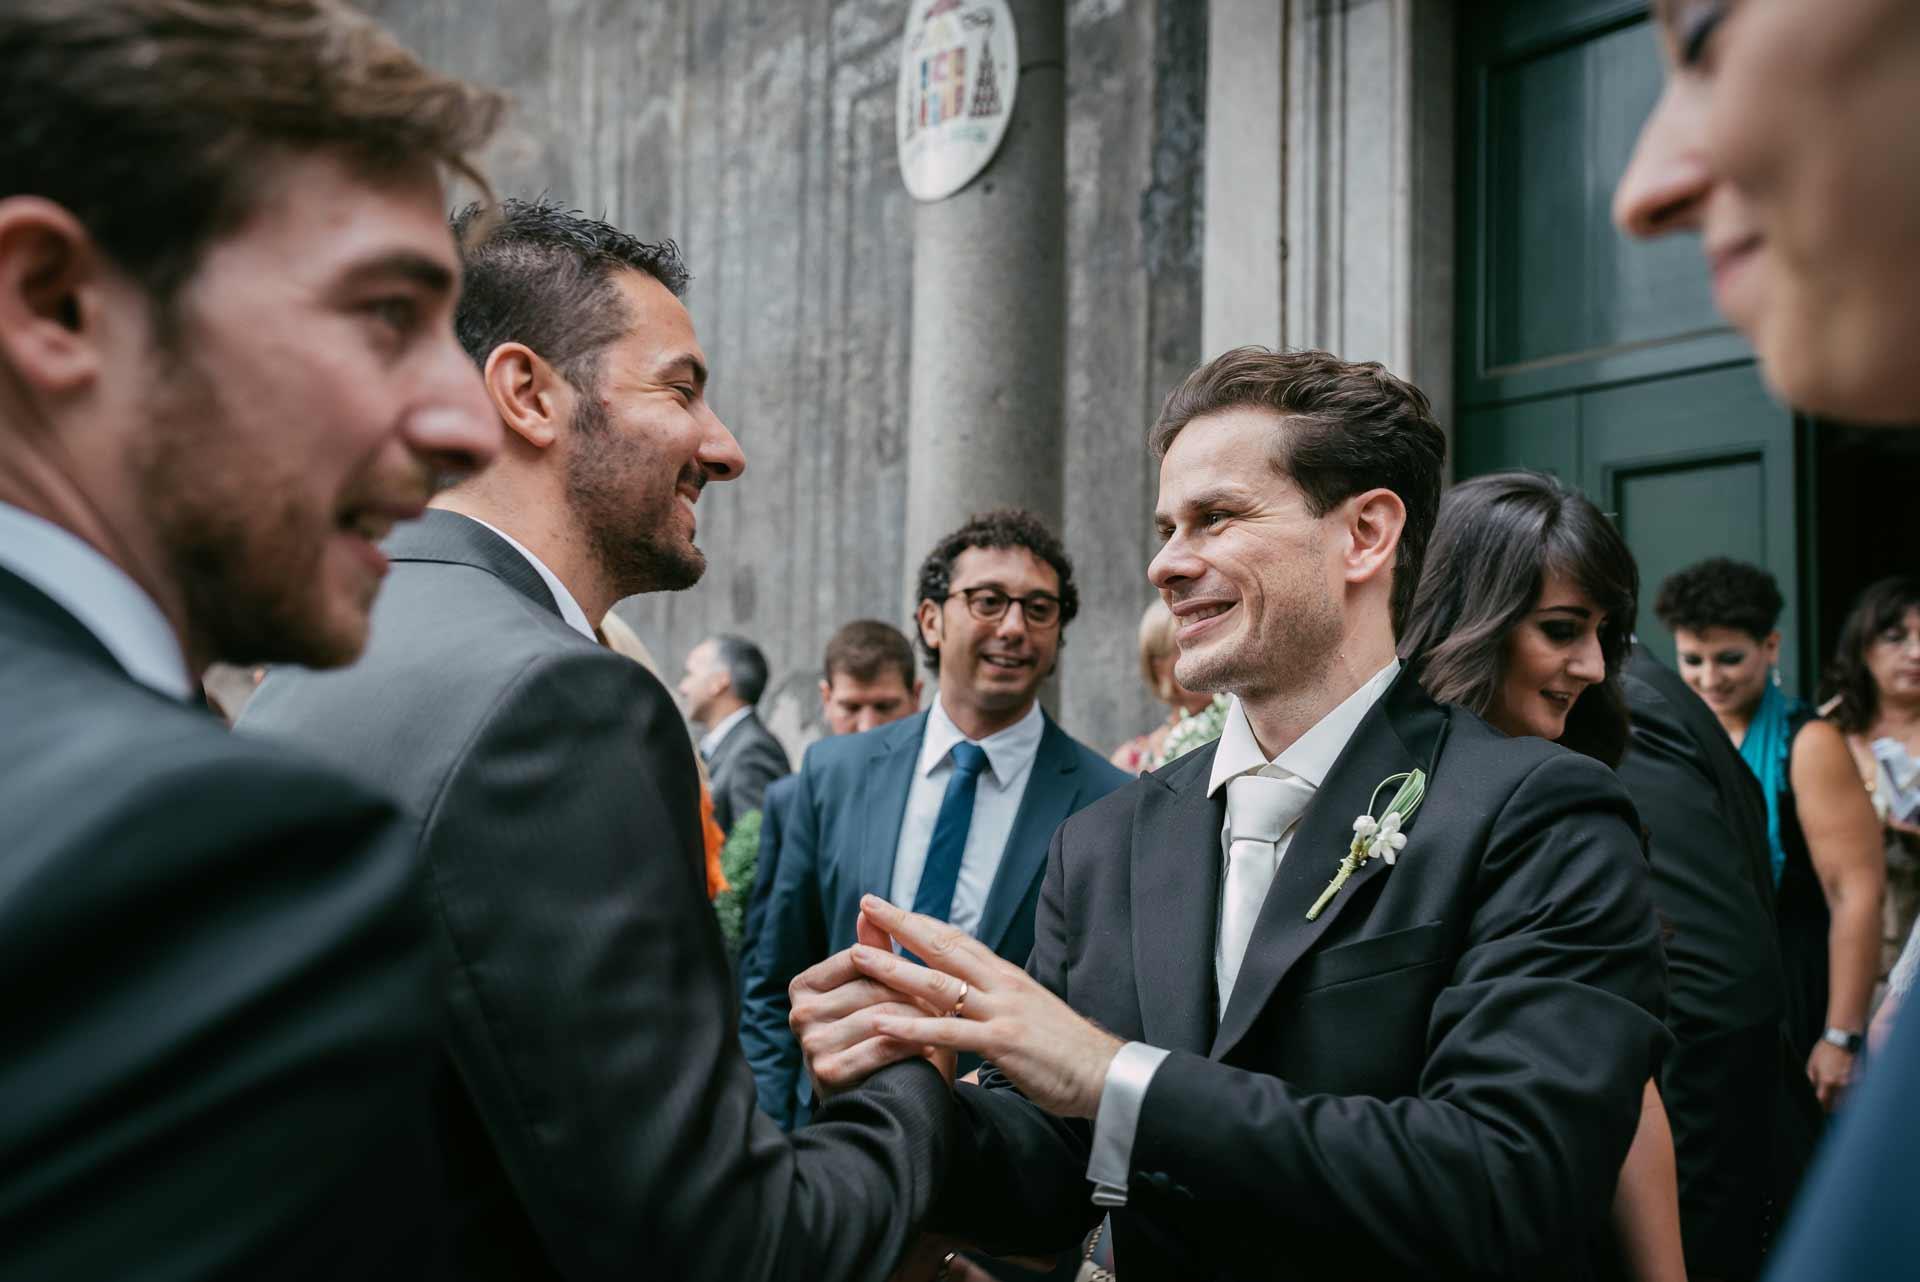 Candid-wedding-photos-4